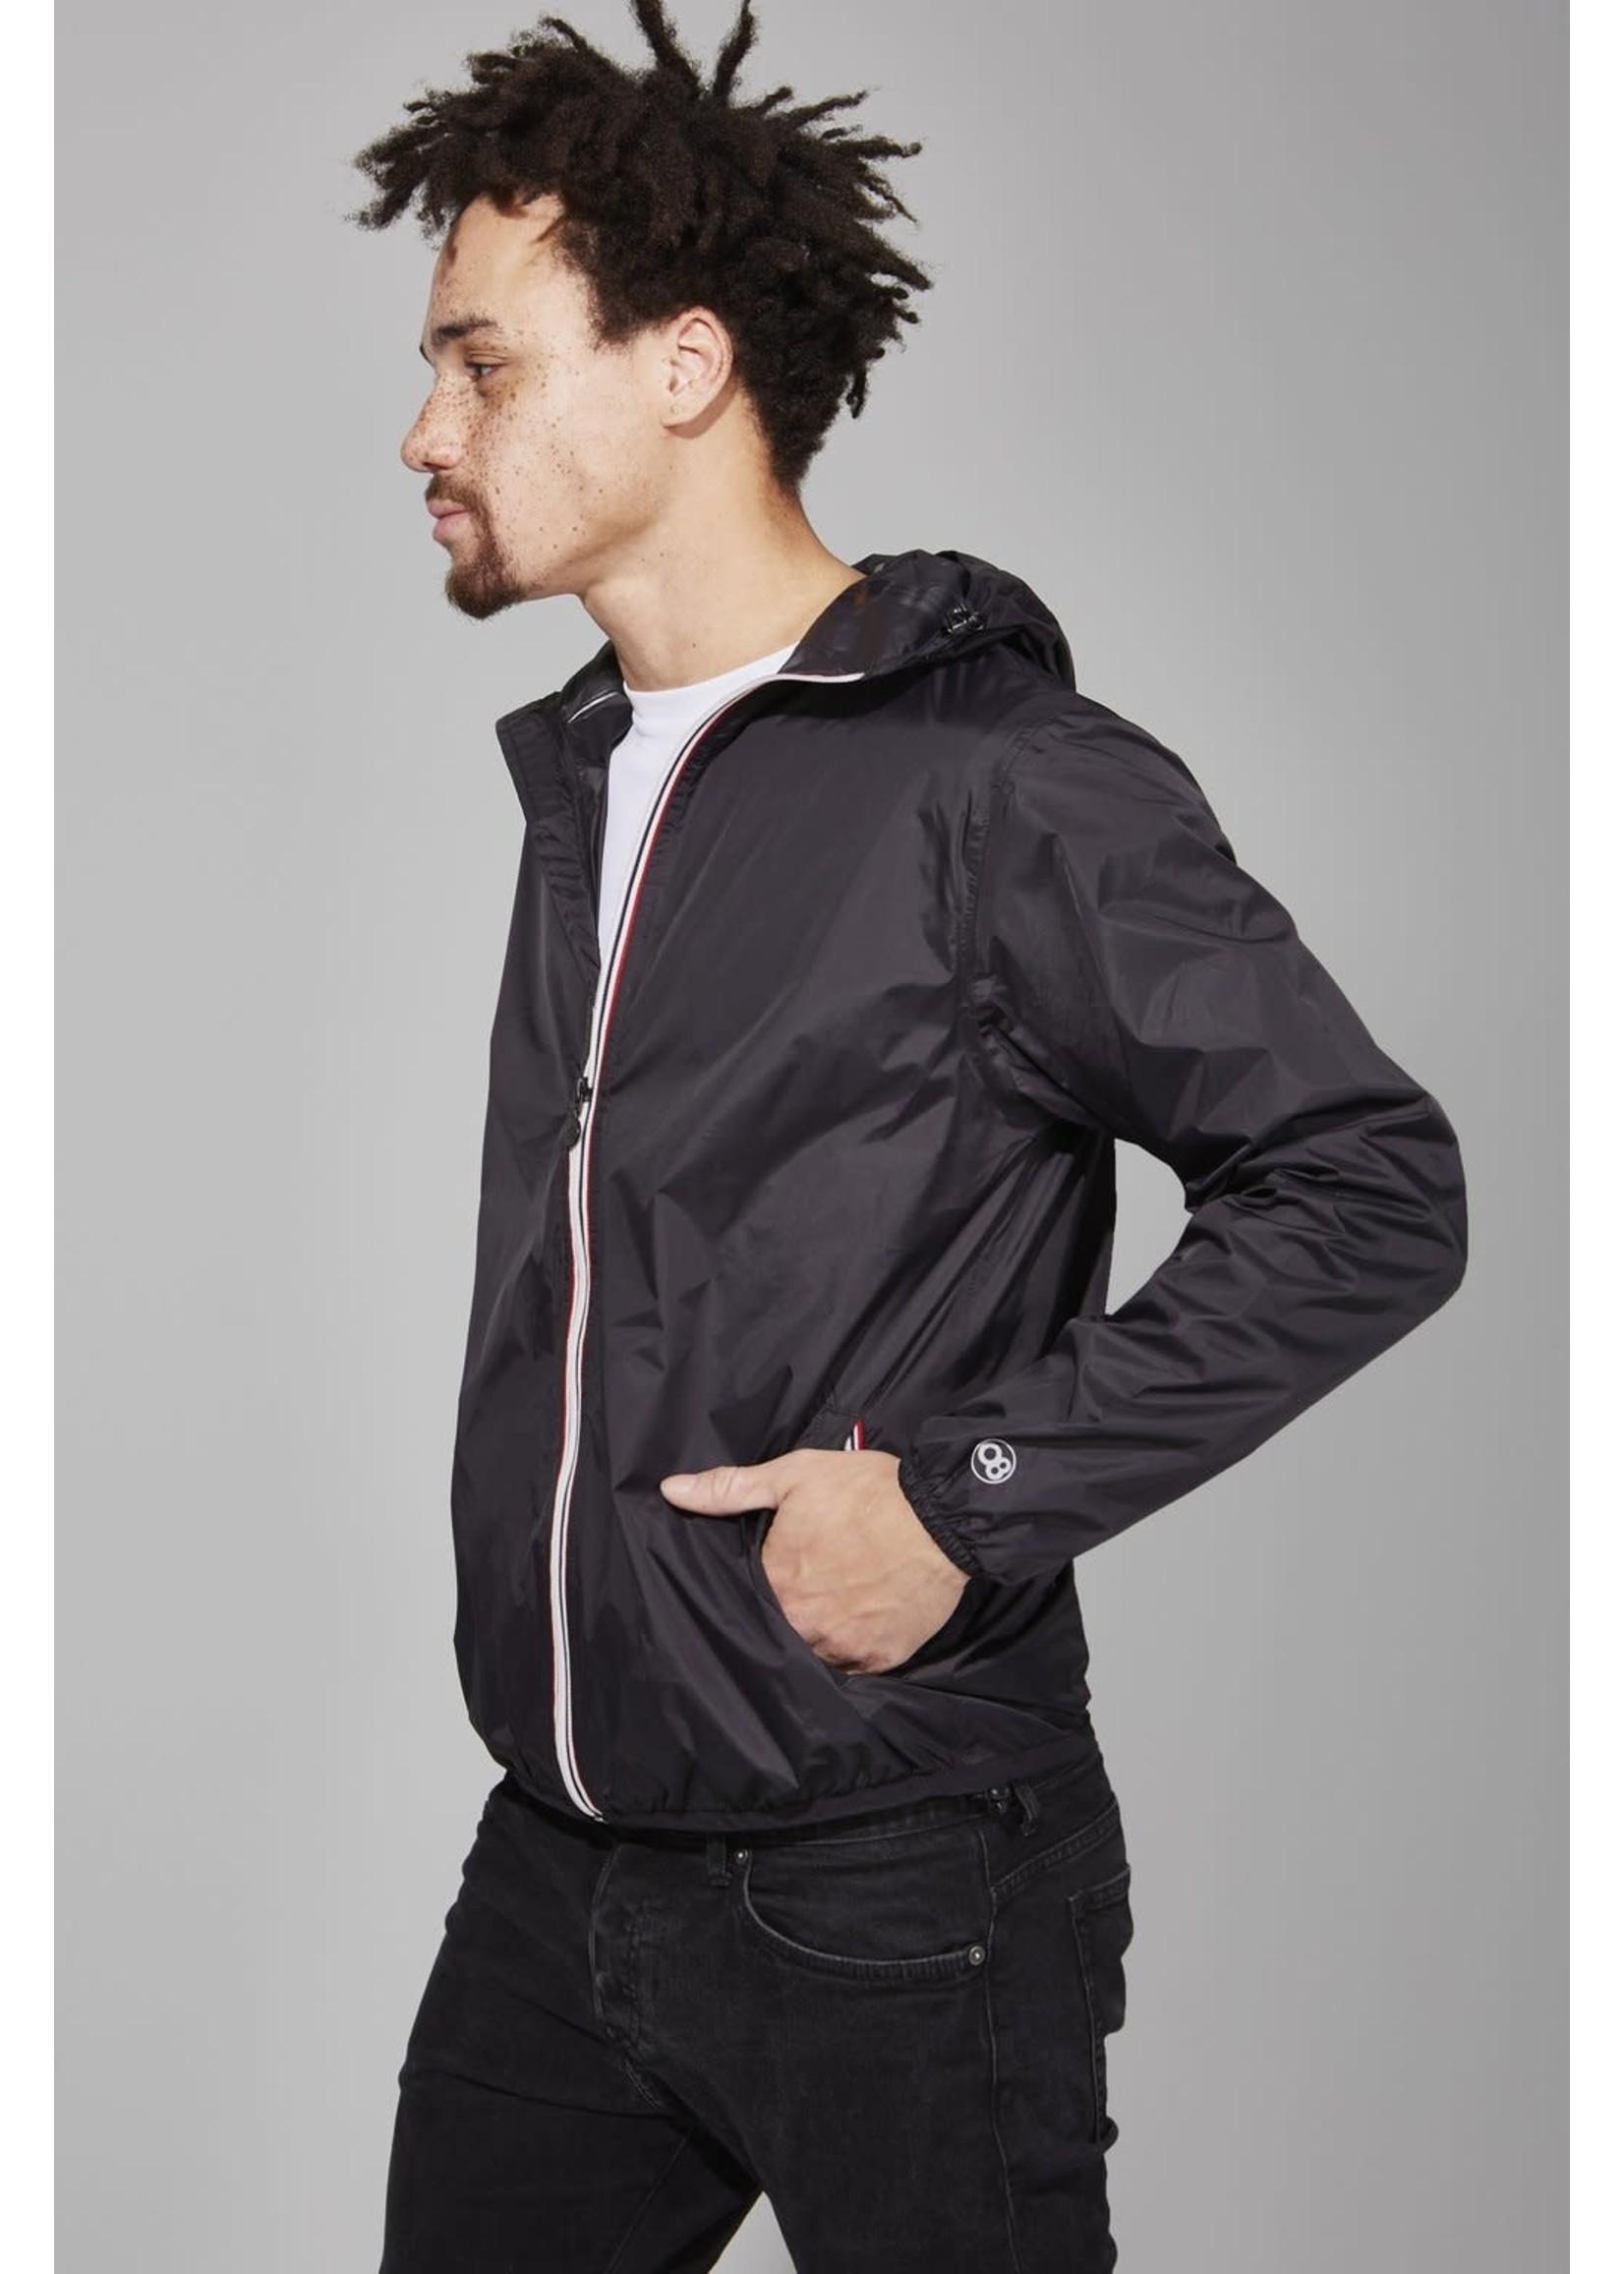 O8 O8 Men's Zip jacket Black